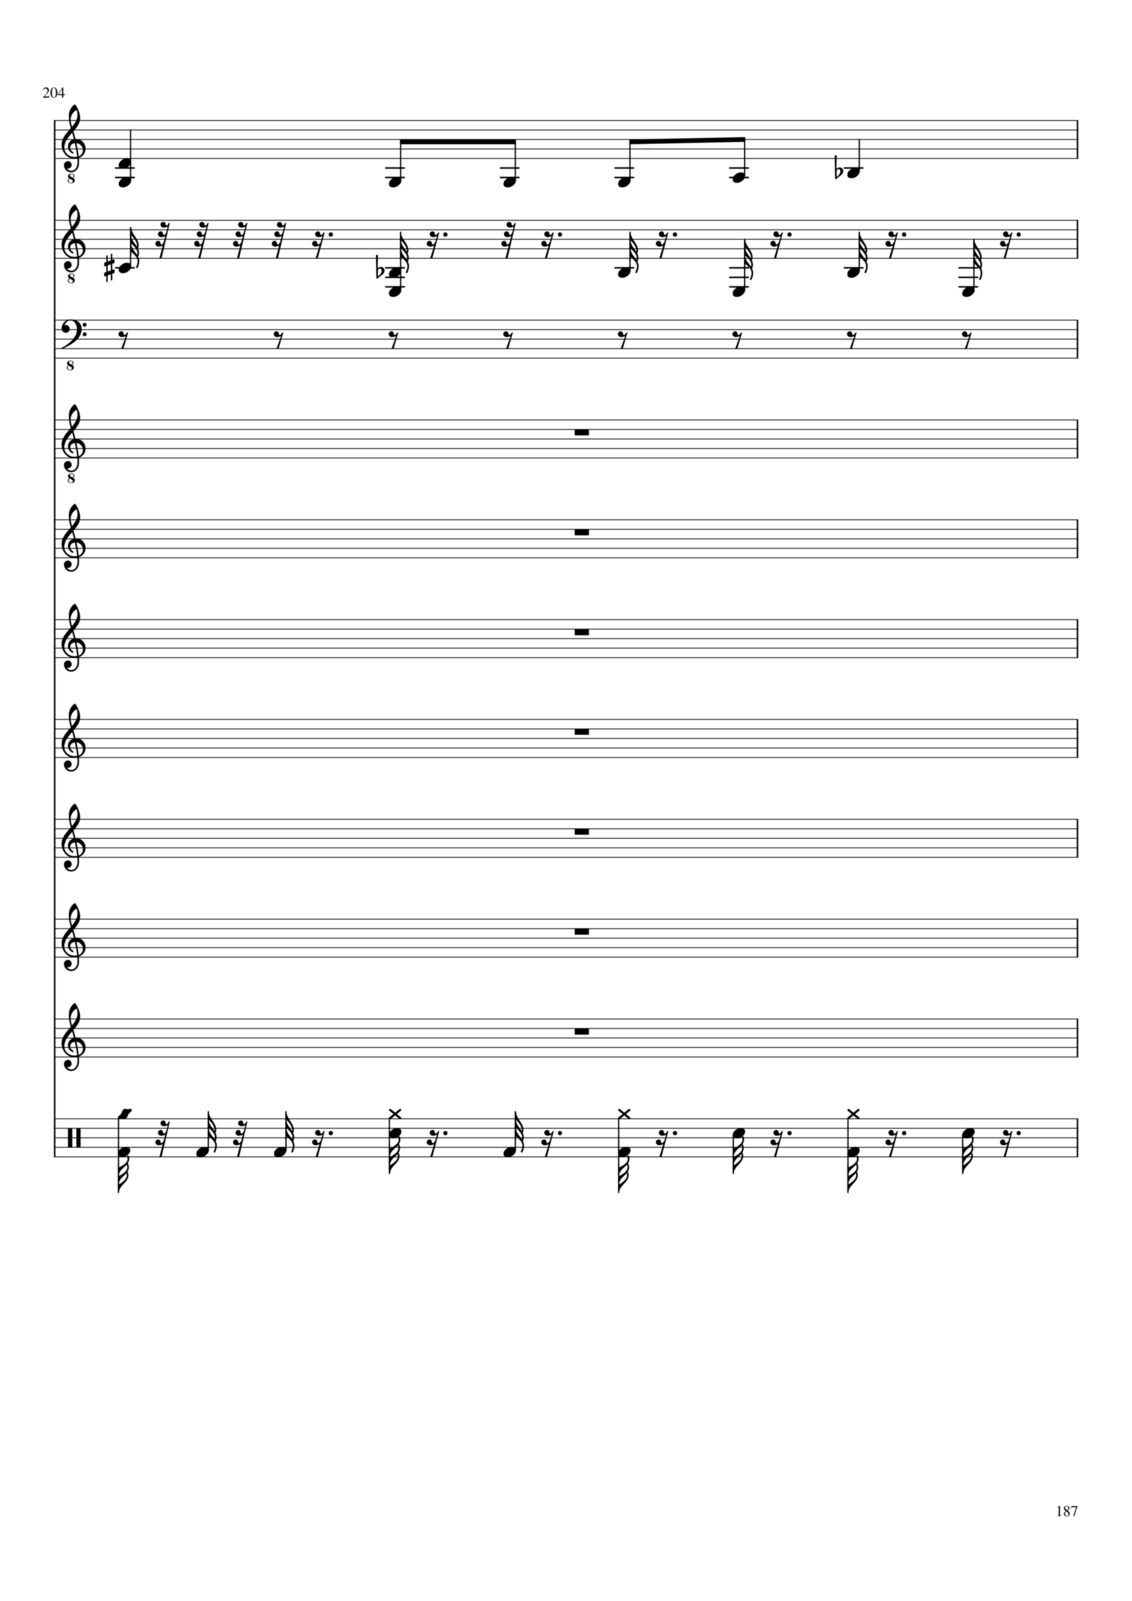 Belyiy sokol slide, Image 187